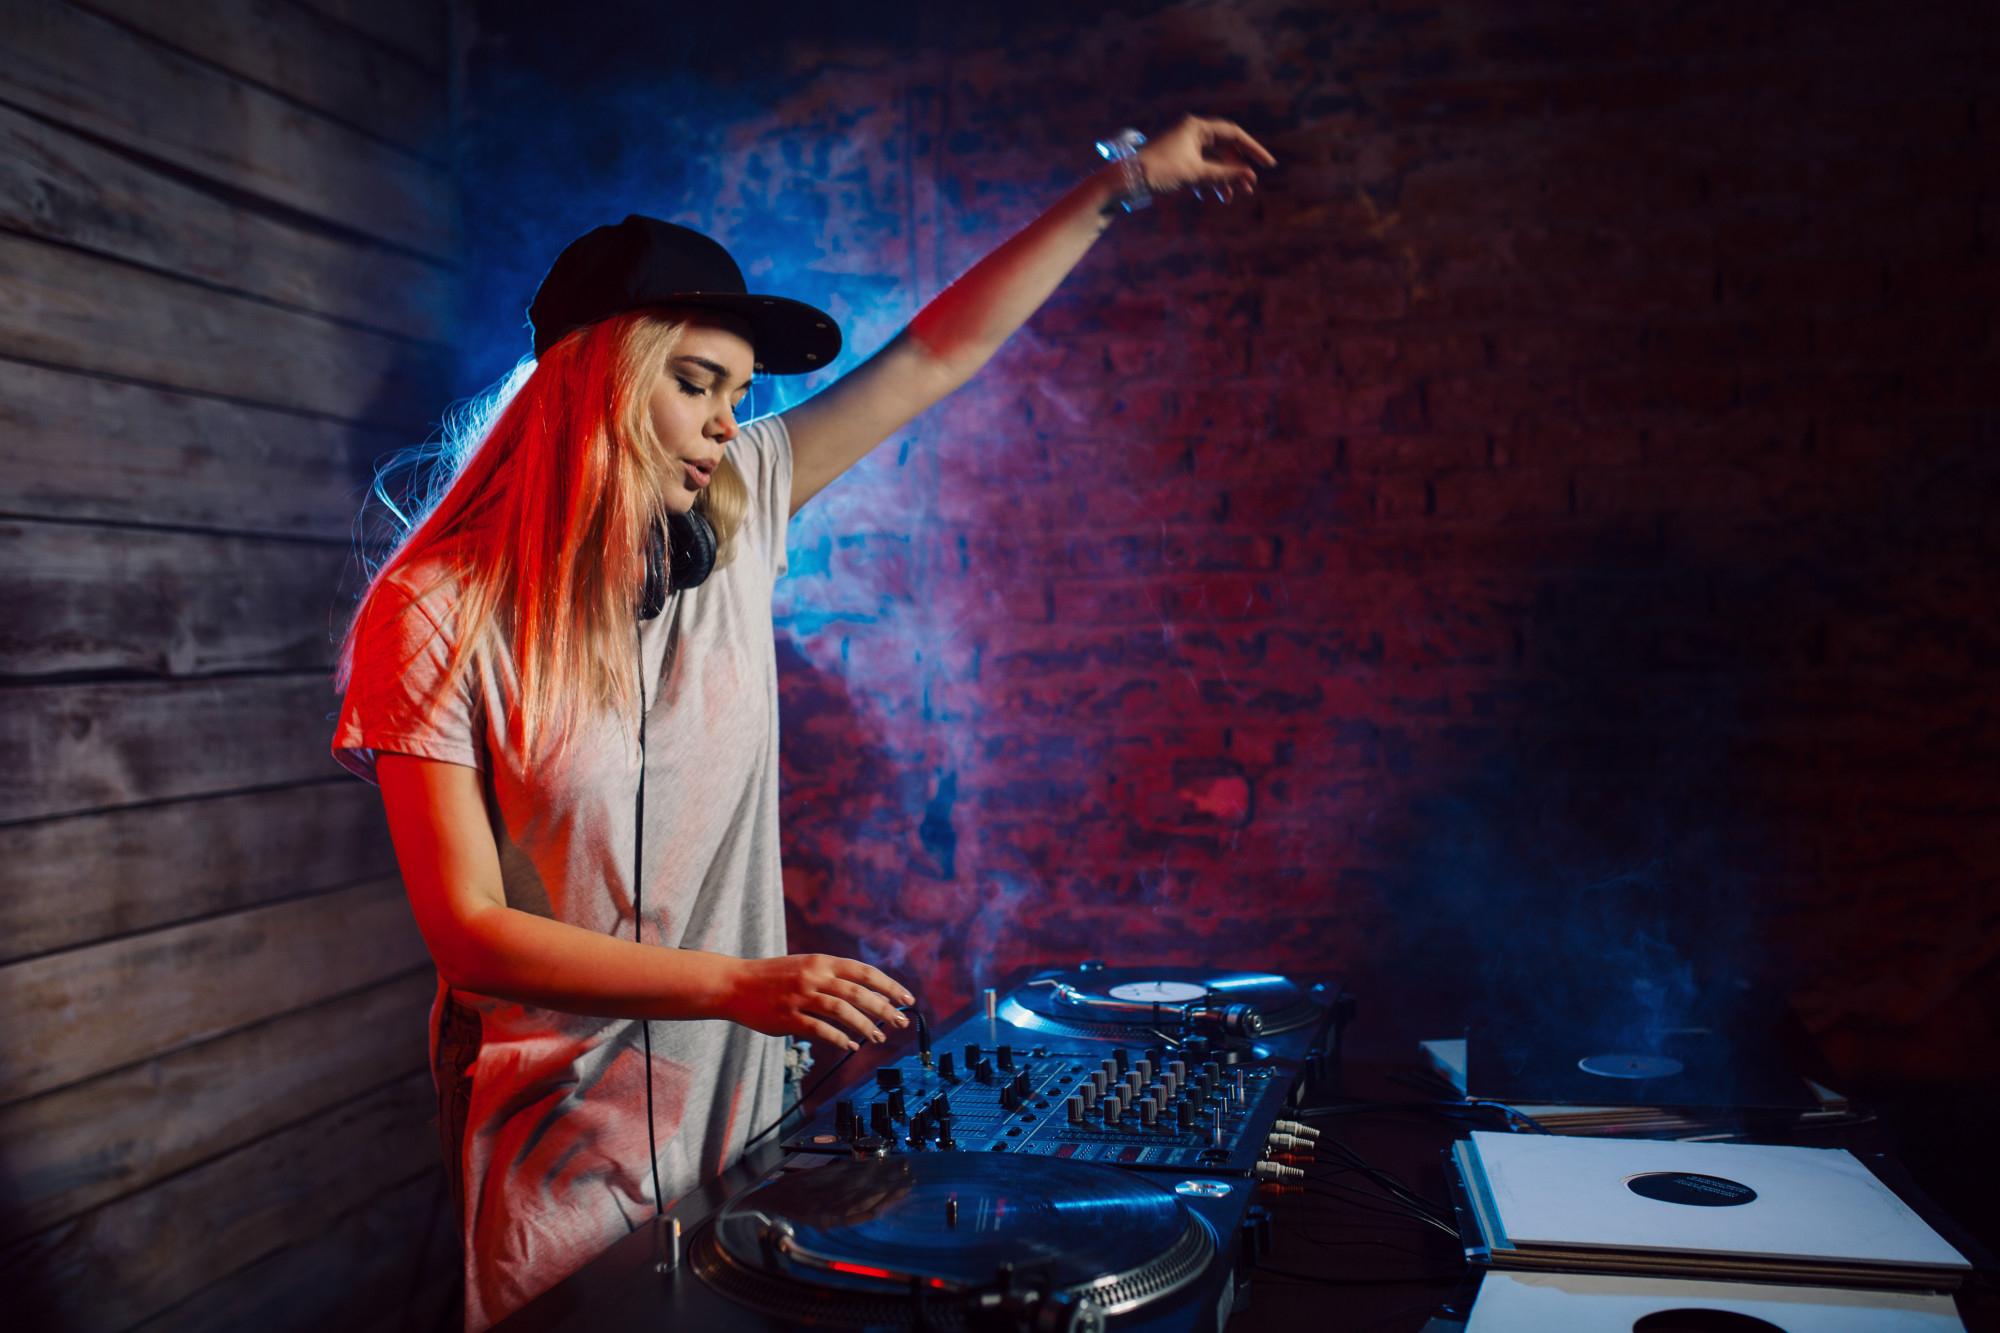 cute-dj-woman-having-fun-playing-music-club-party